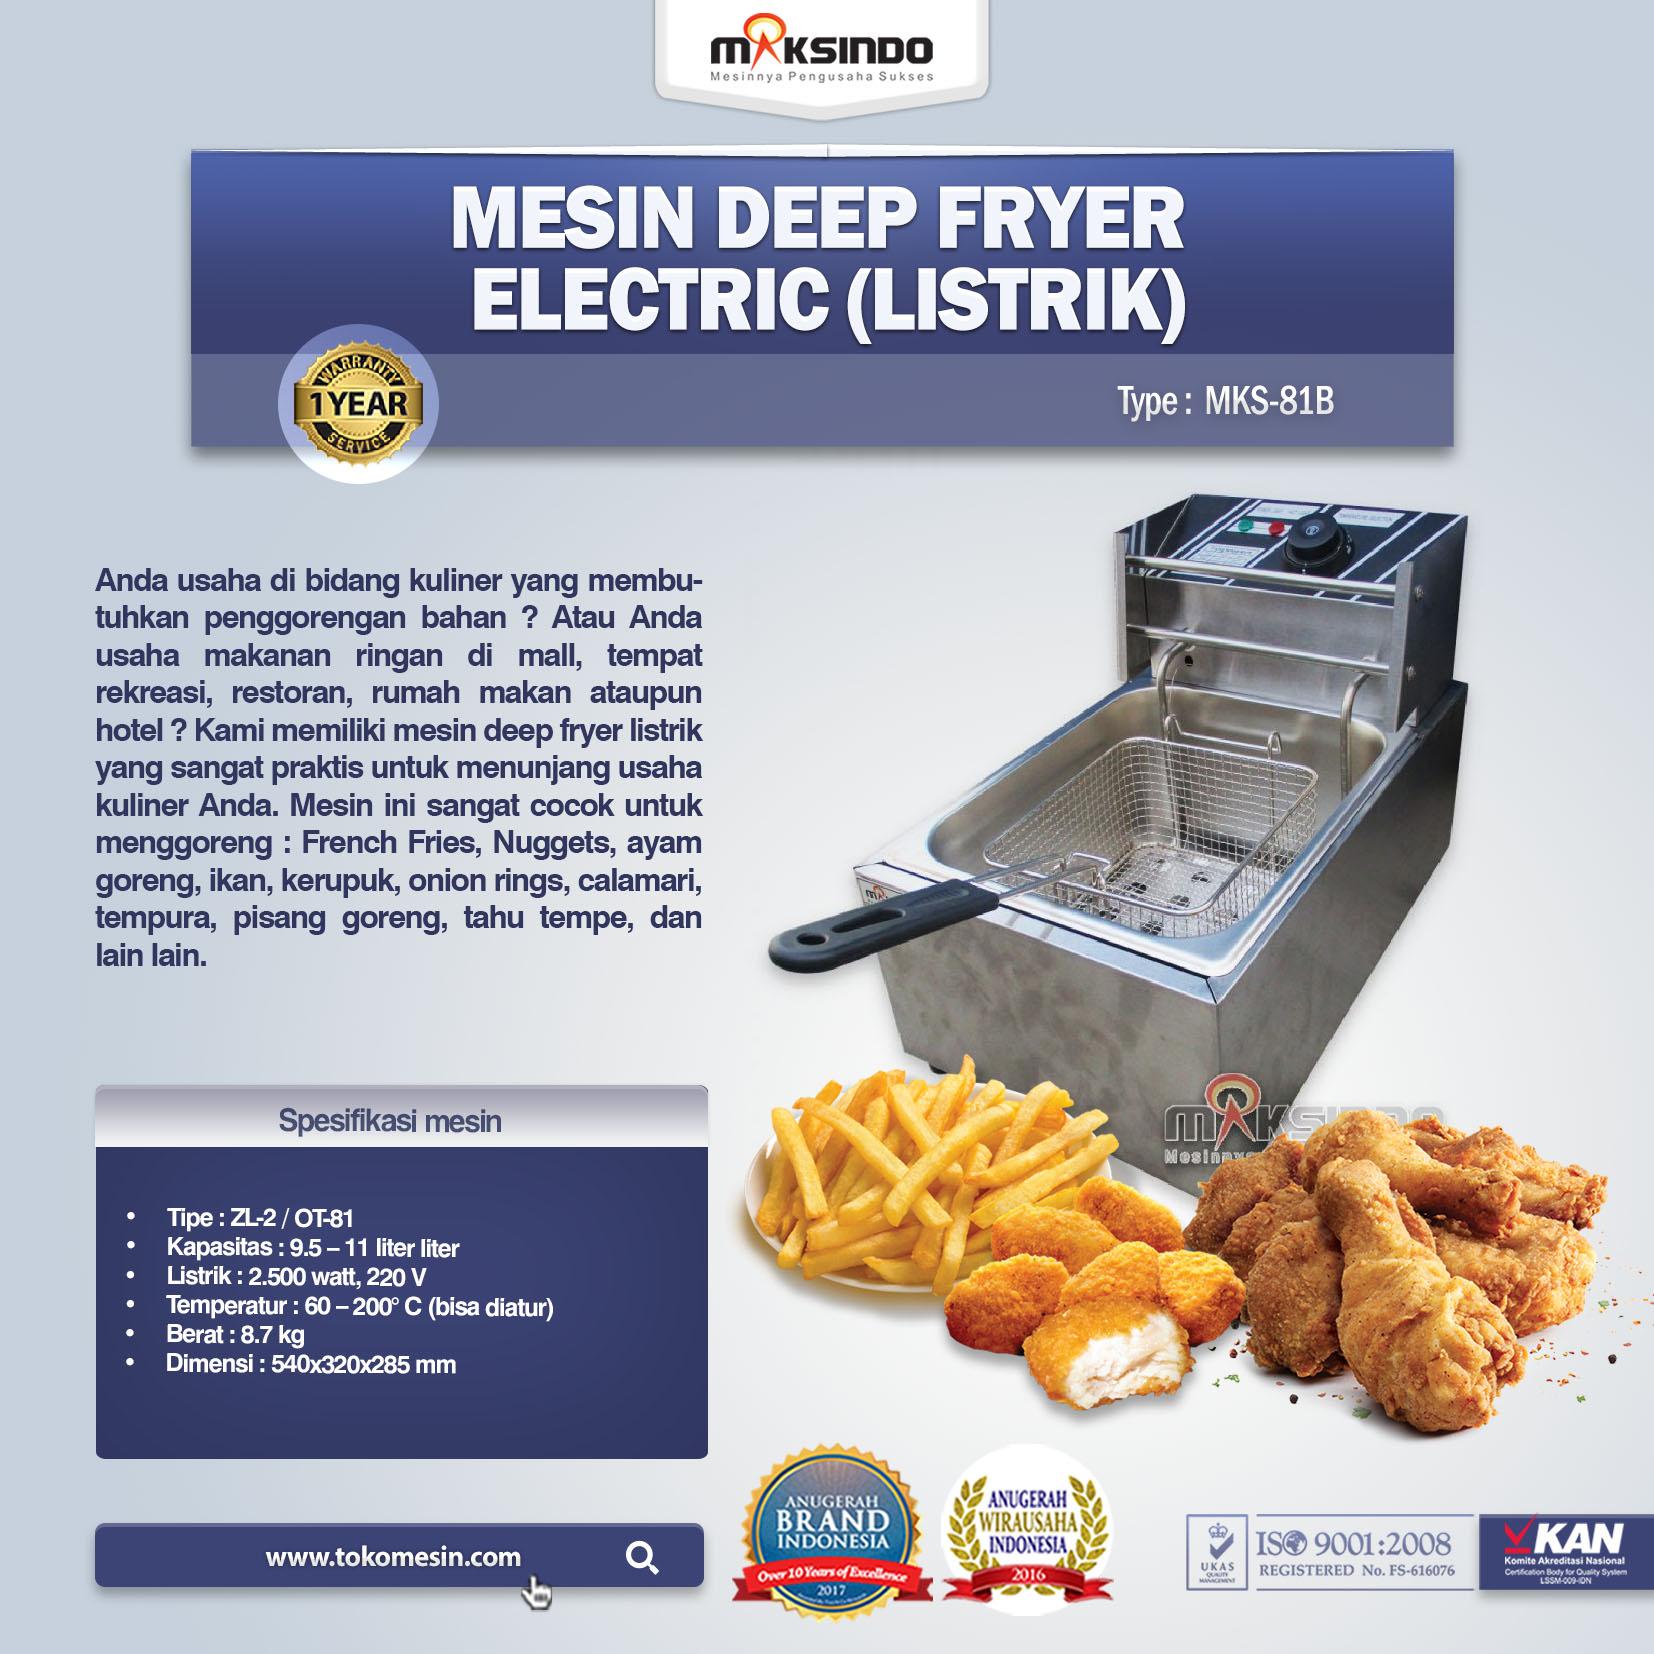 Mesin Deep Fryer Electric (Listrik) MKS-81B